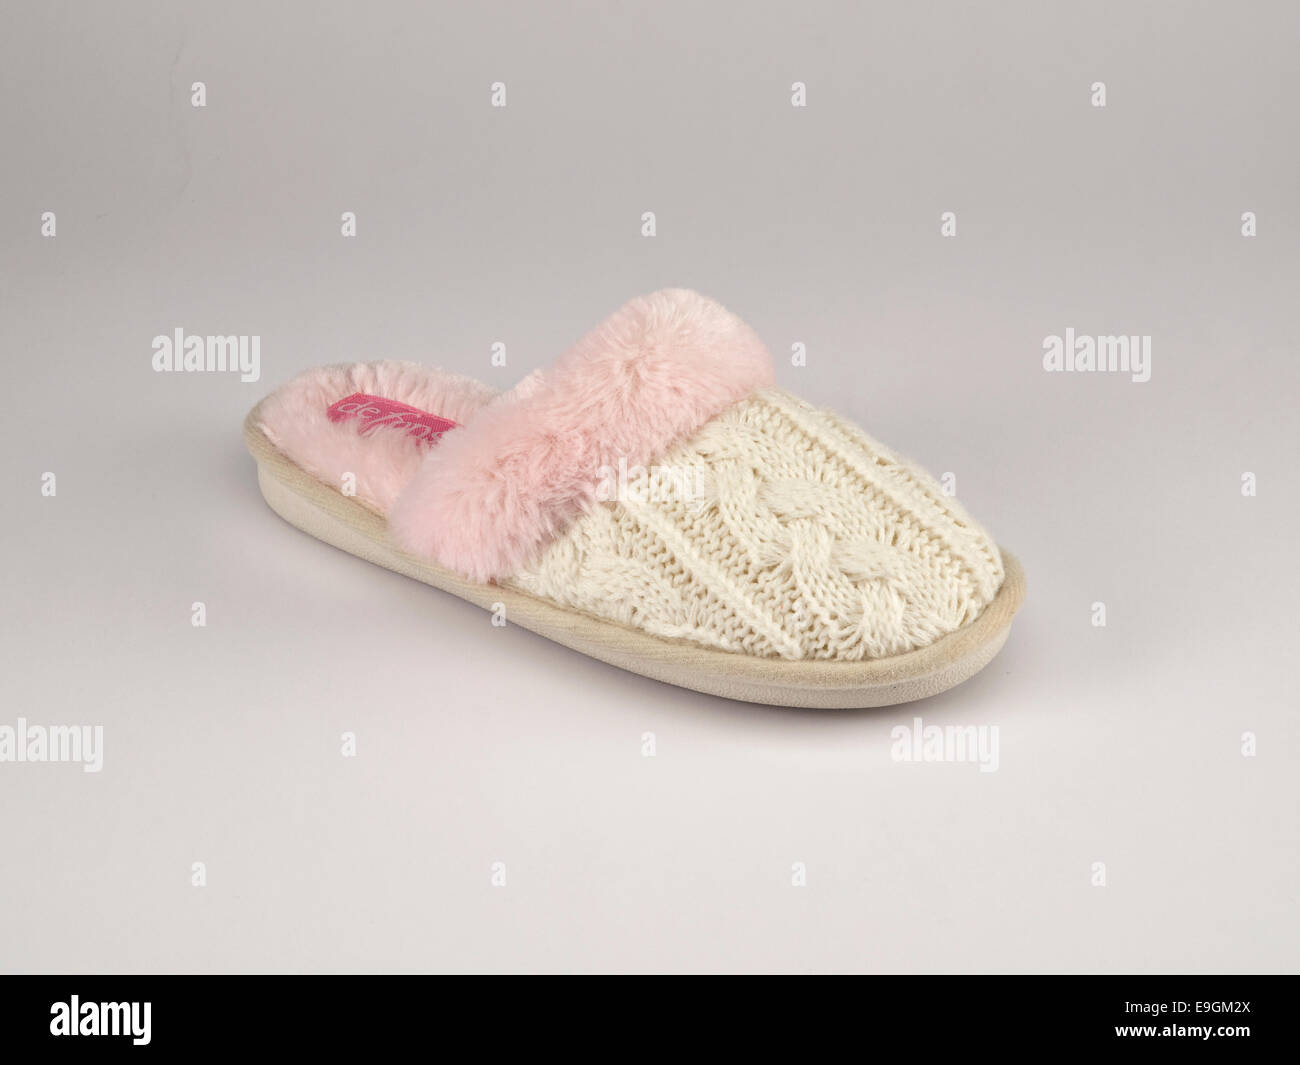 White woman's slipper - Stock Image